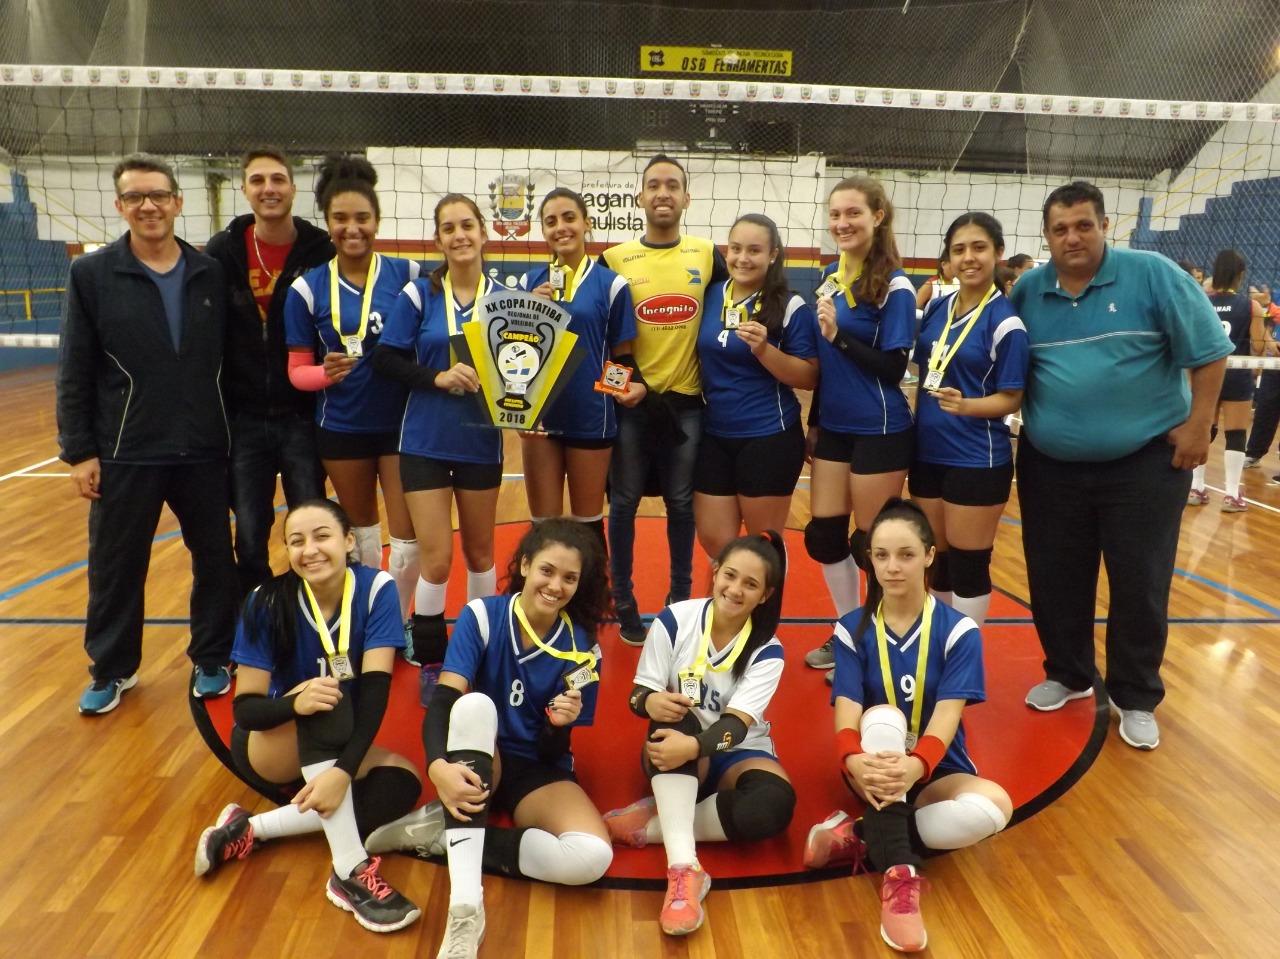 equipe categoria infantil campeã da XX Copa Itatiba de Voleibol edit